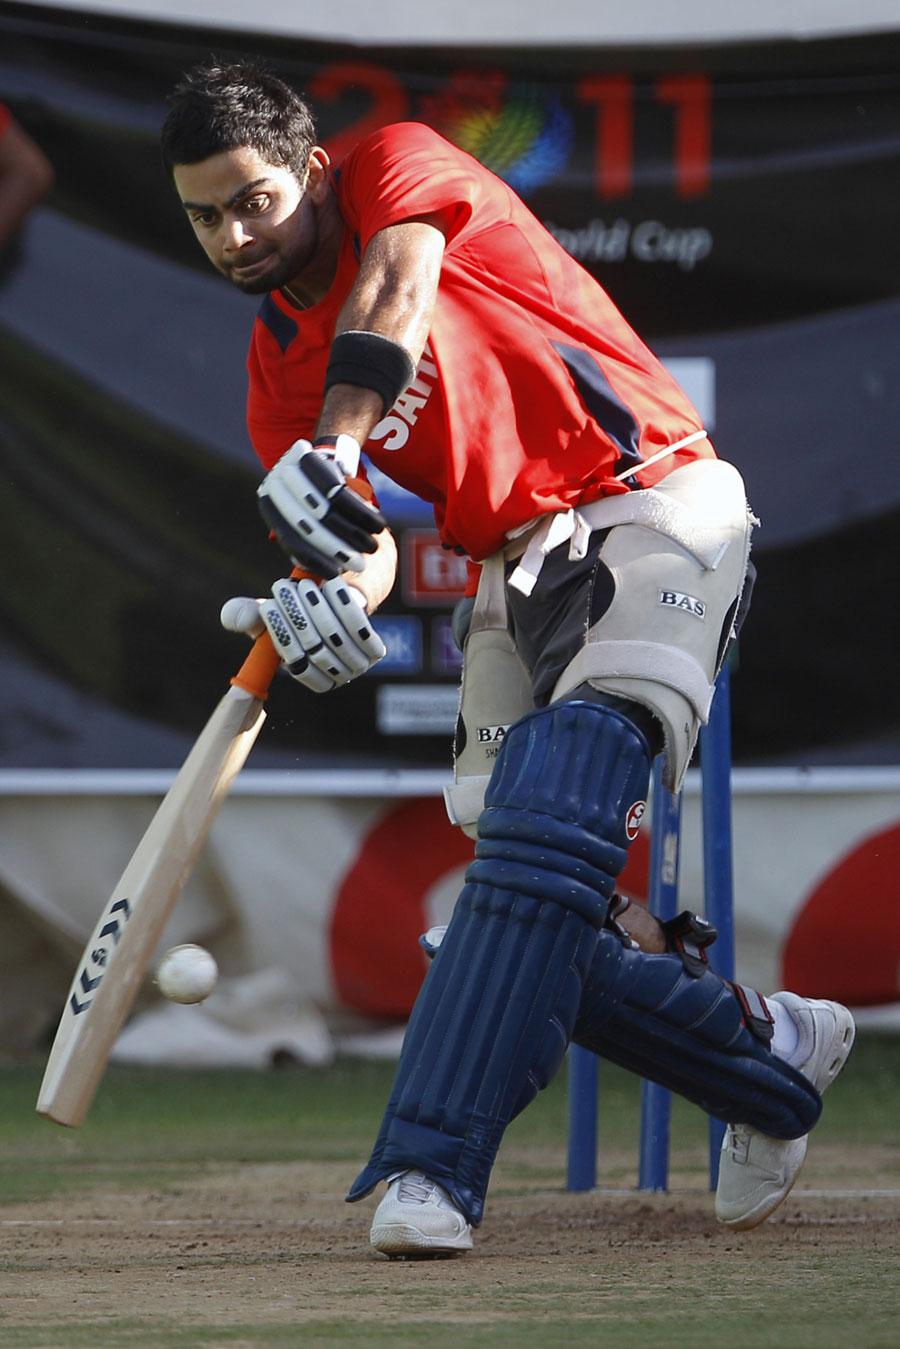 Virat Kohli hones his skills during practice